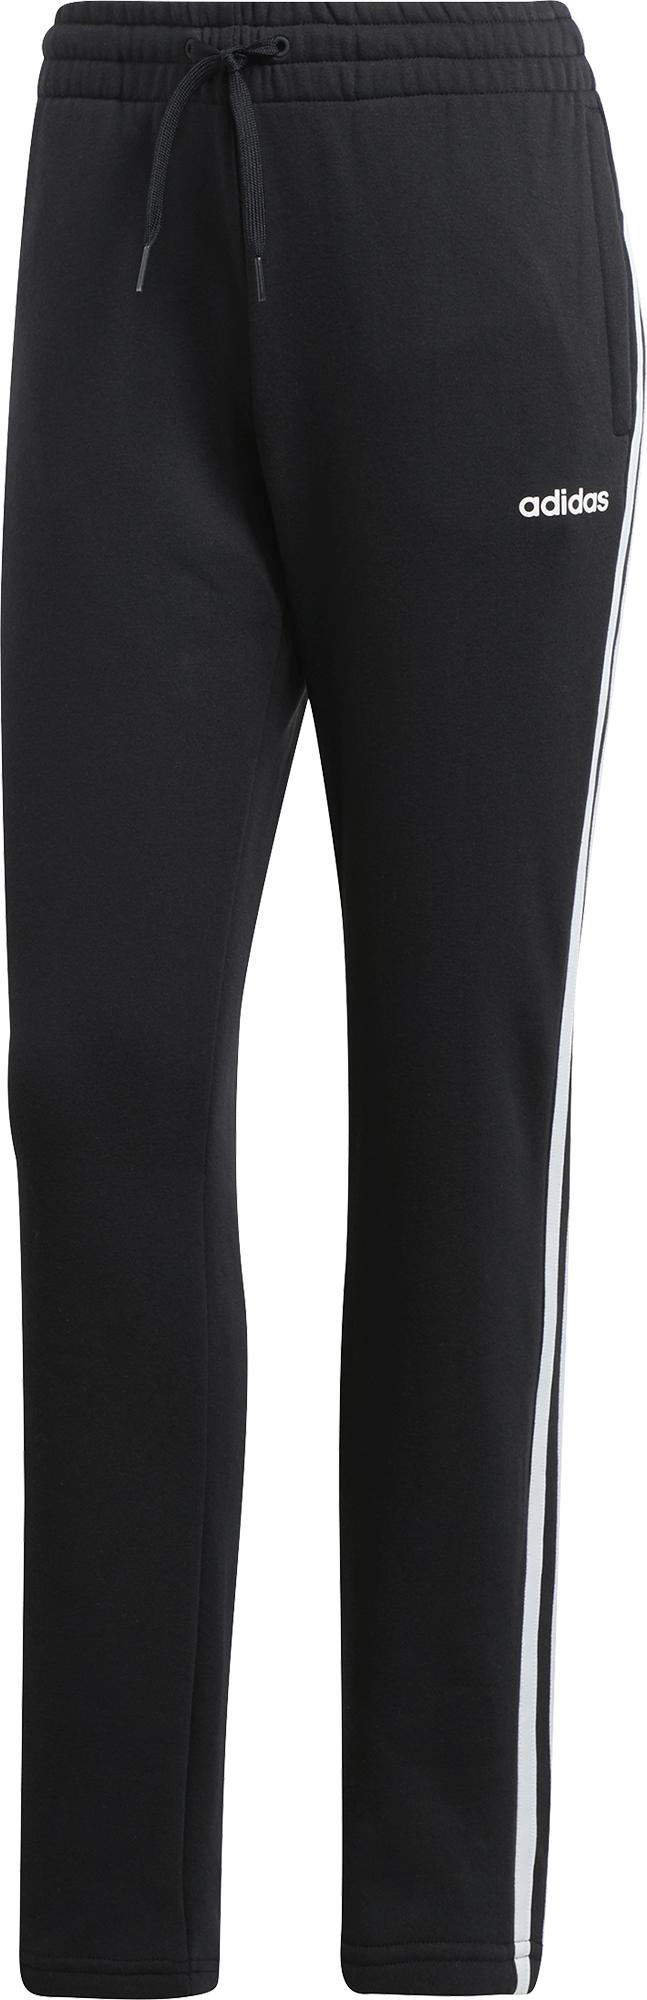 Adidas Брюки женские Essentials 3-Stripes, размер 54-56